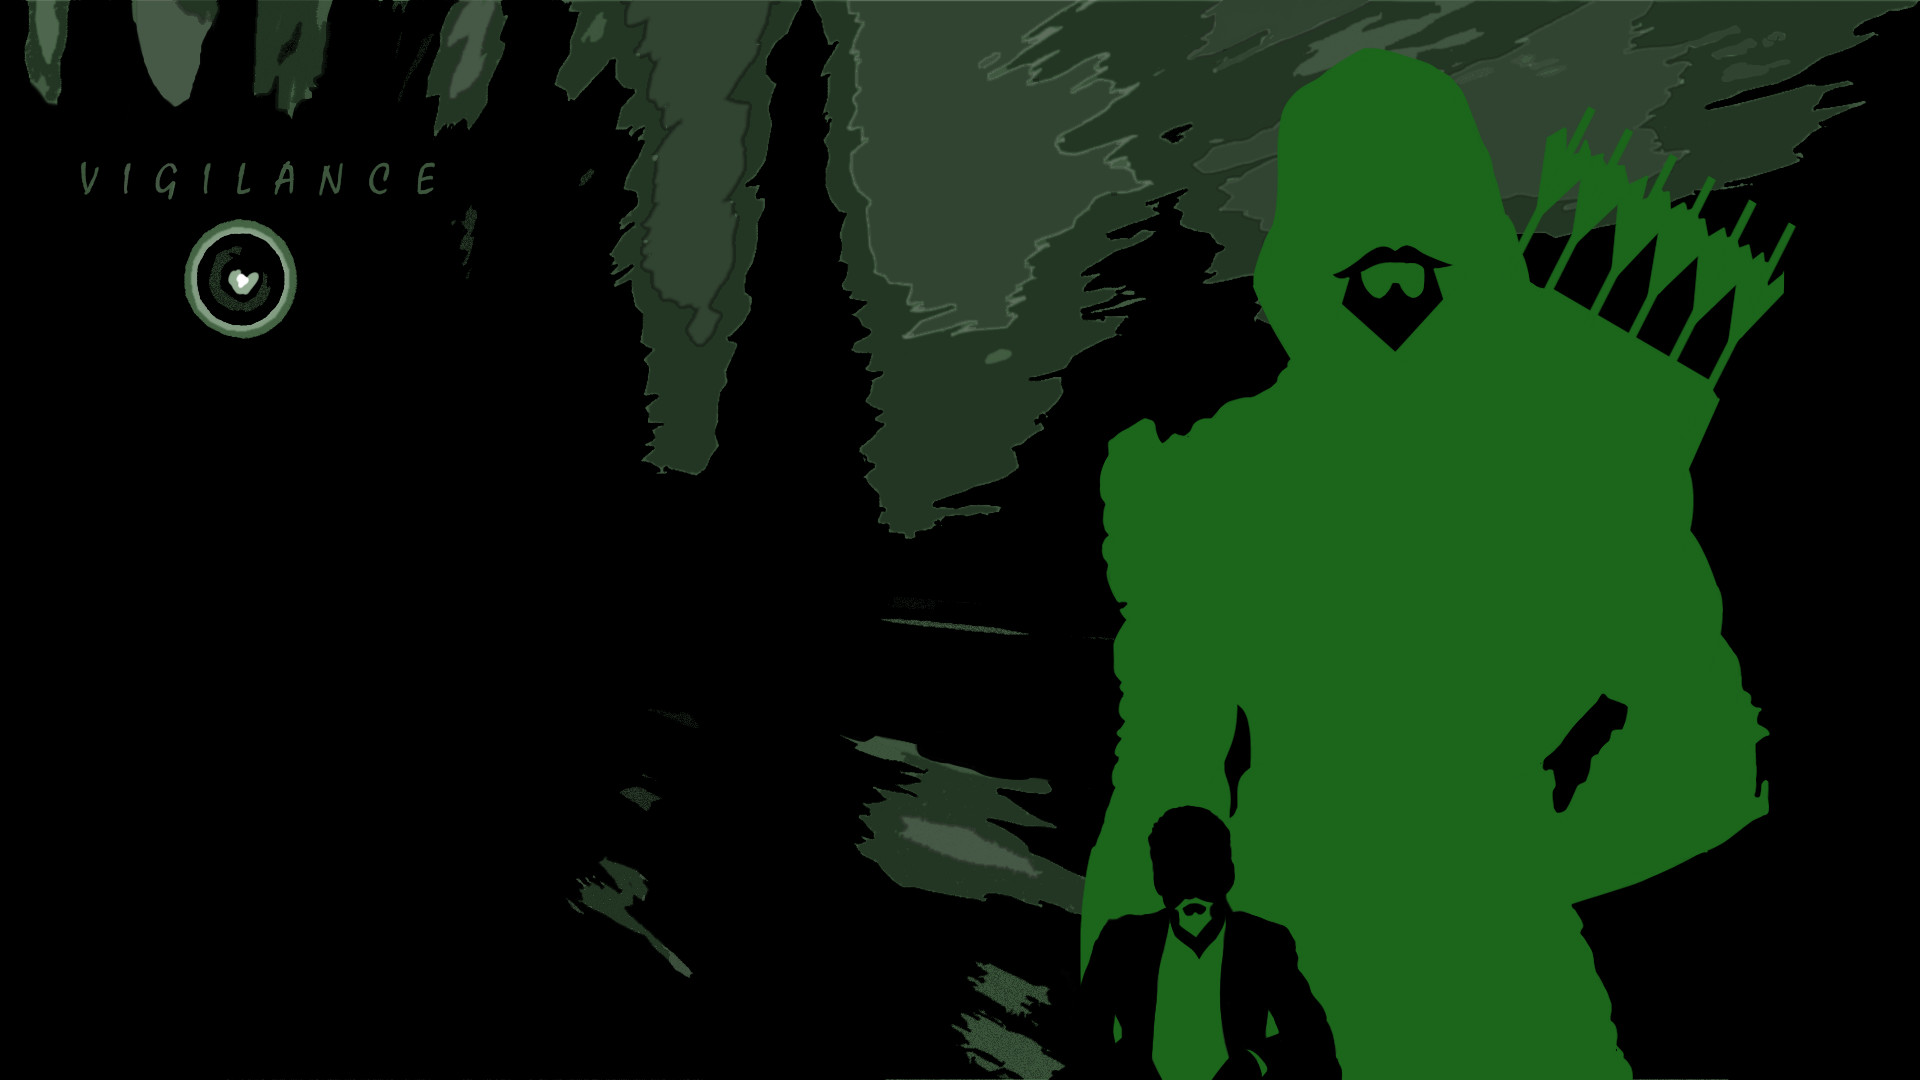 … ky 83 green arrow wallpaper fantastic green arrow hd wallpapers …